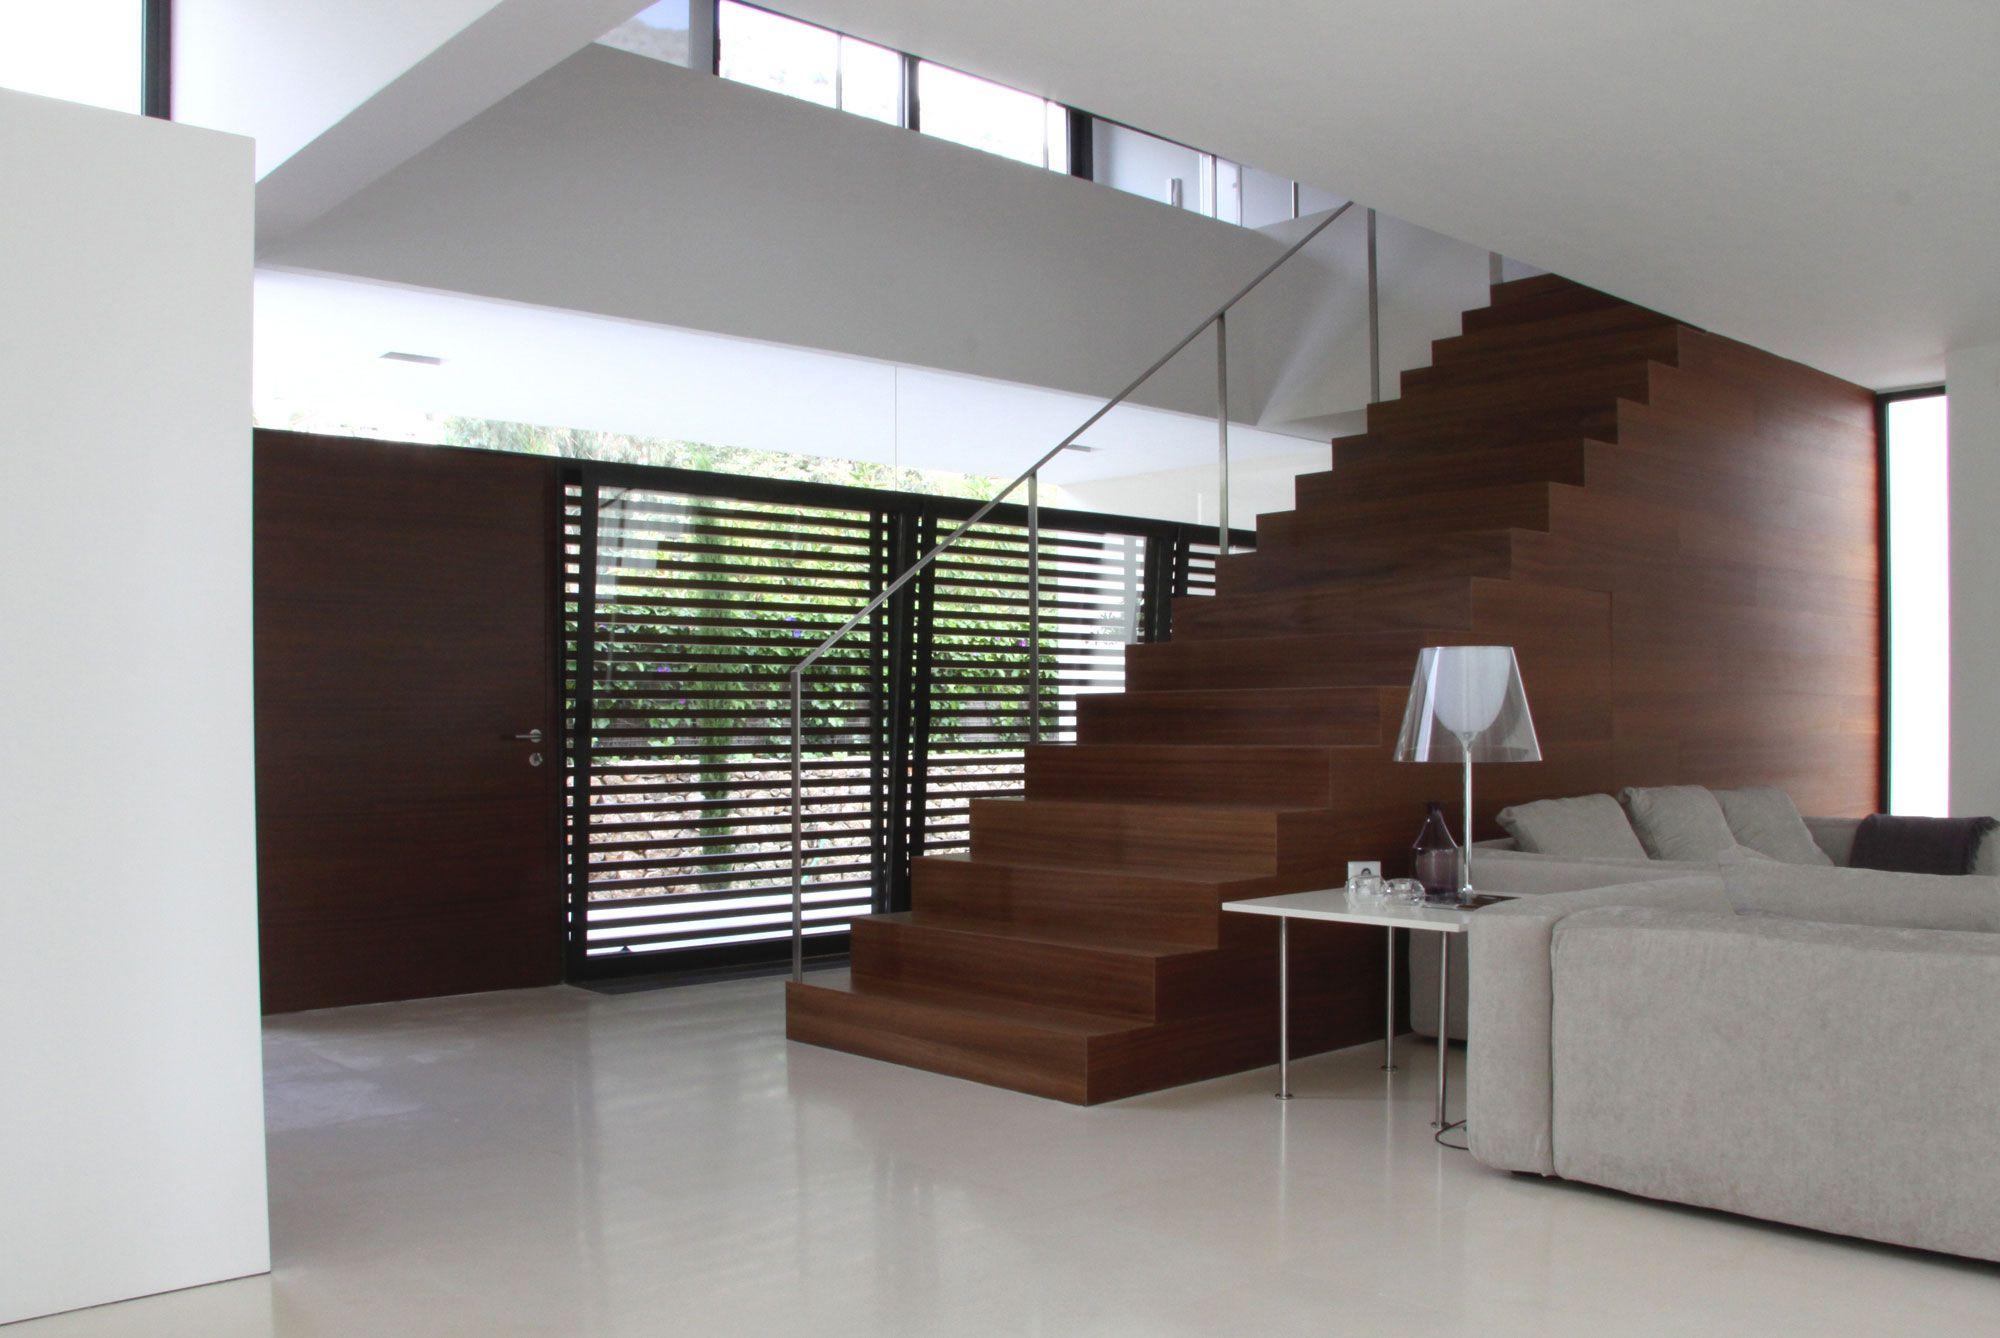 Casa-Bauzà-13